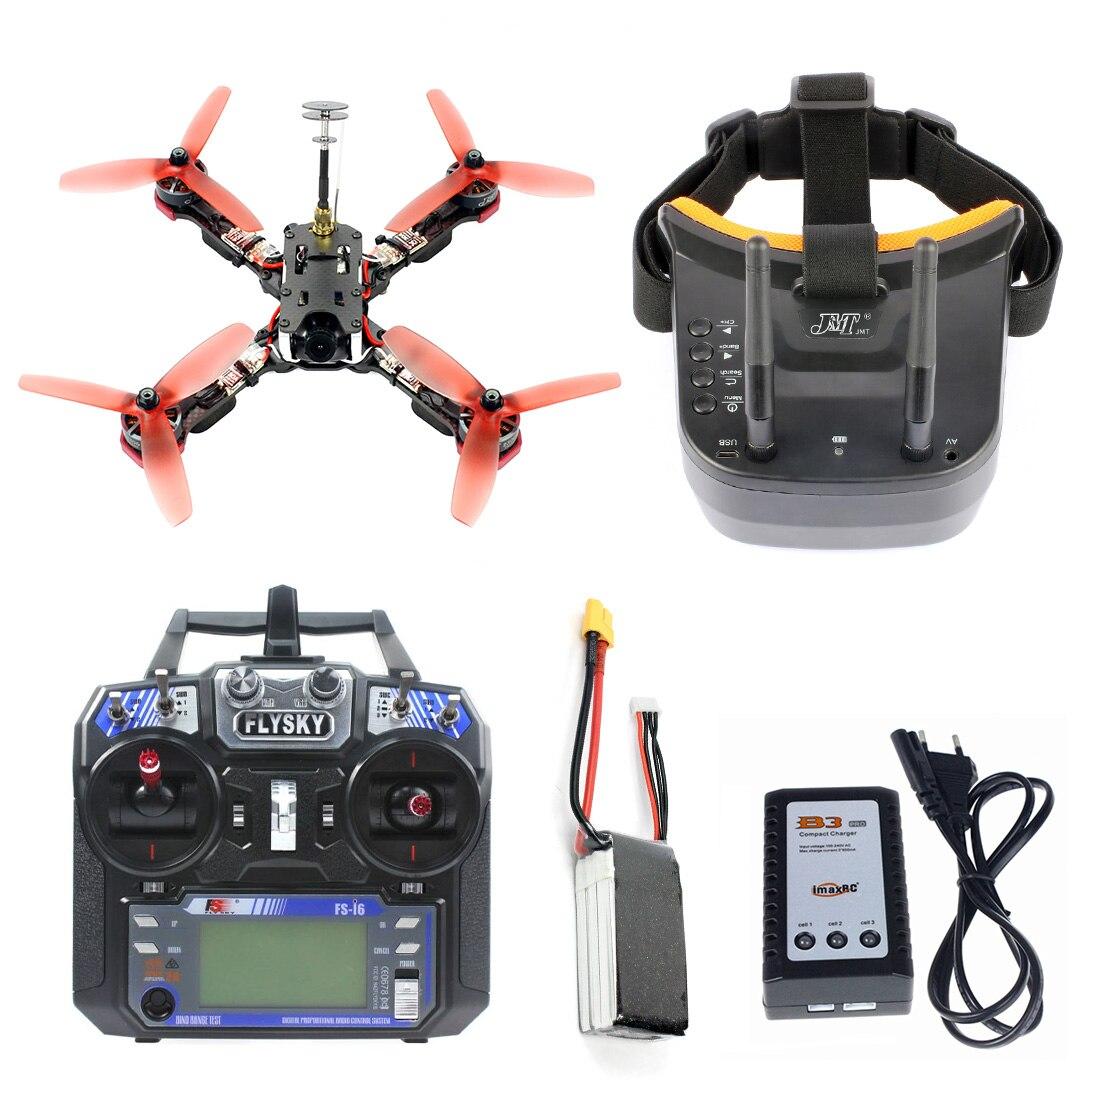 Frog 218mm 2.4G 6CH RC Racer Drone RTF Betaflight F4 Pro V2 BLHeli-s 30A 5.8G 25/200/400mW VTX Mini 700TVL Camera FPV Quadcopter snapper7 brushless micro 75mm 5 8g fpv racer drone 2 4g 6ch rc quadcopter rtf 700tvl camera vtx